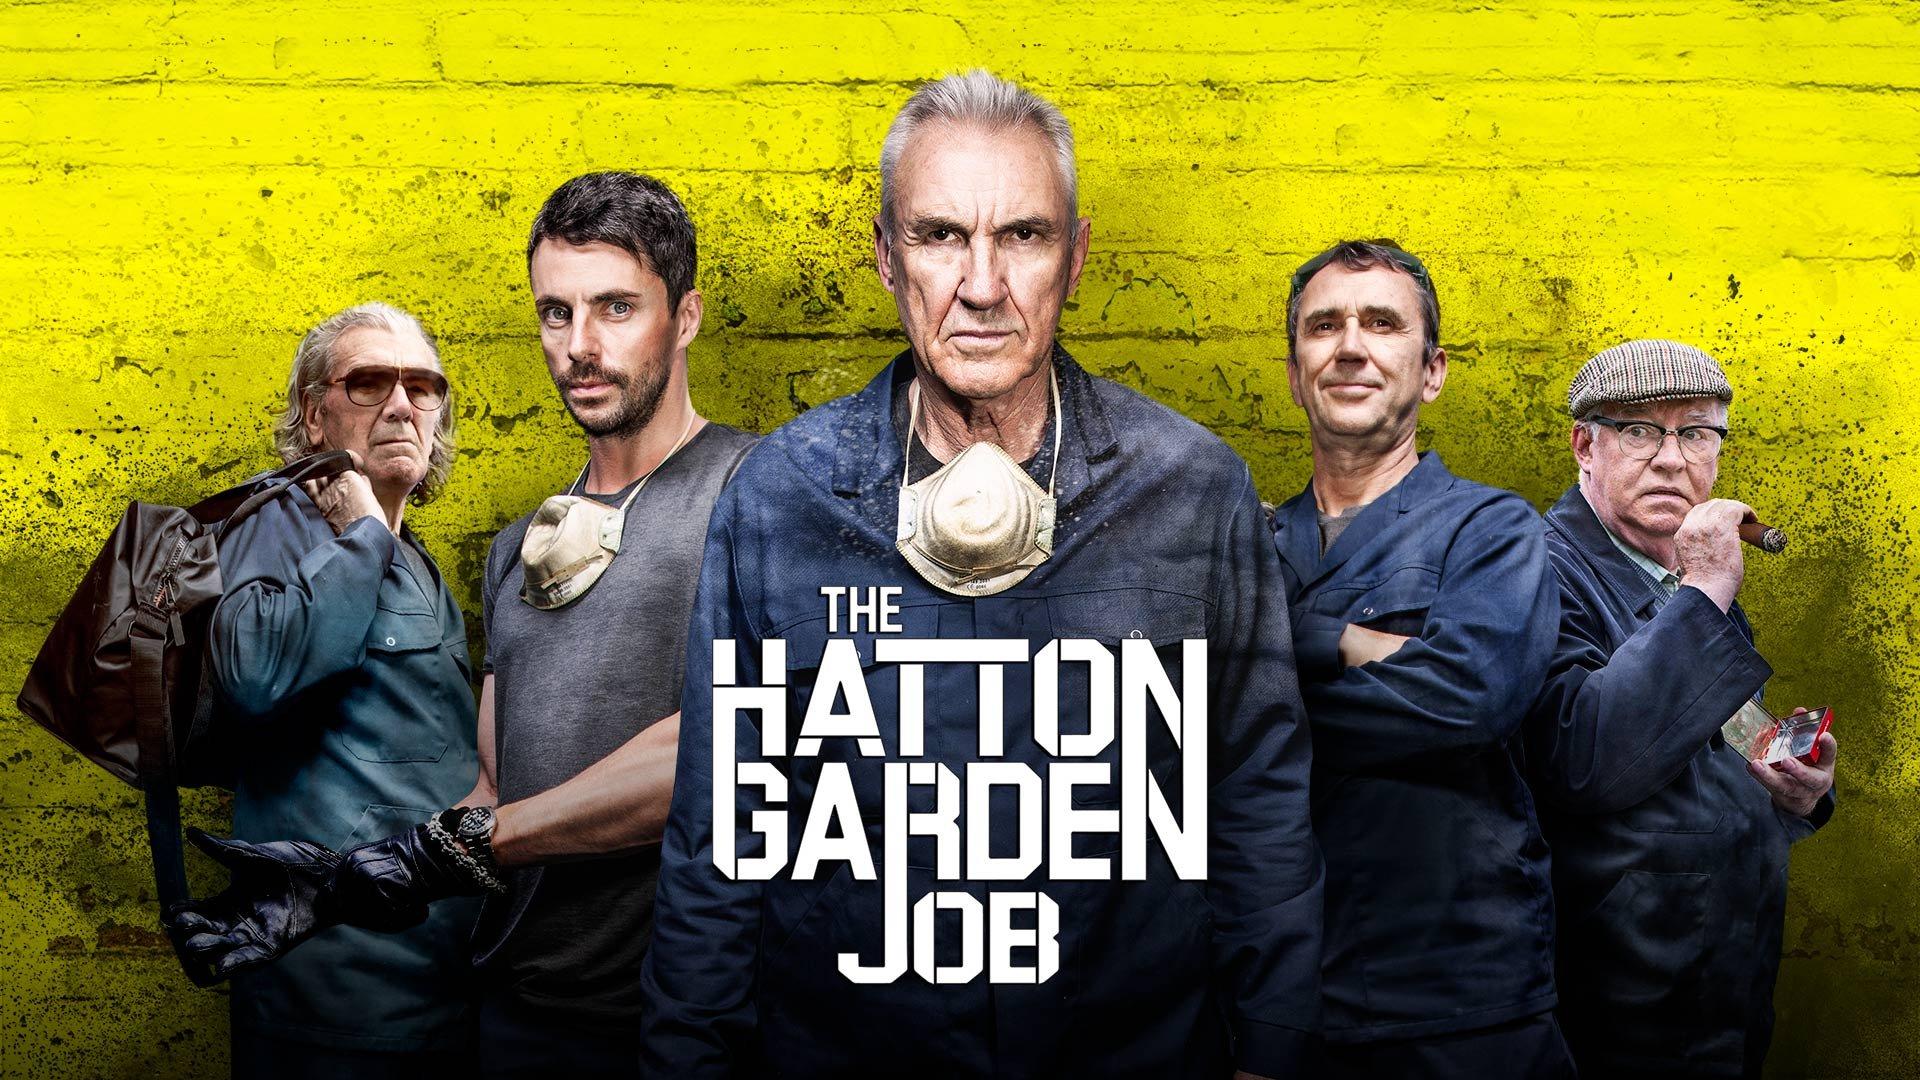 The Hatton Garden Job on BritBox UK